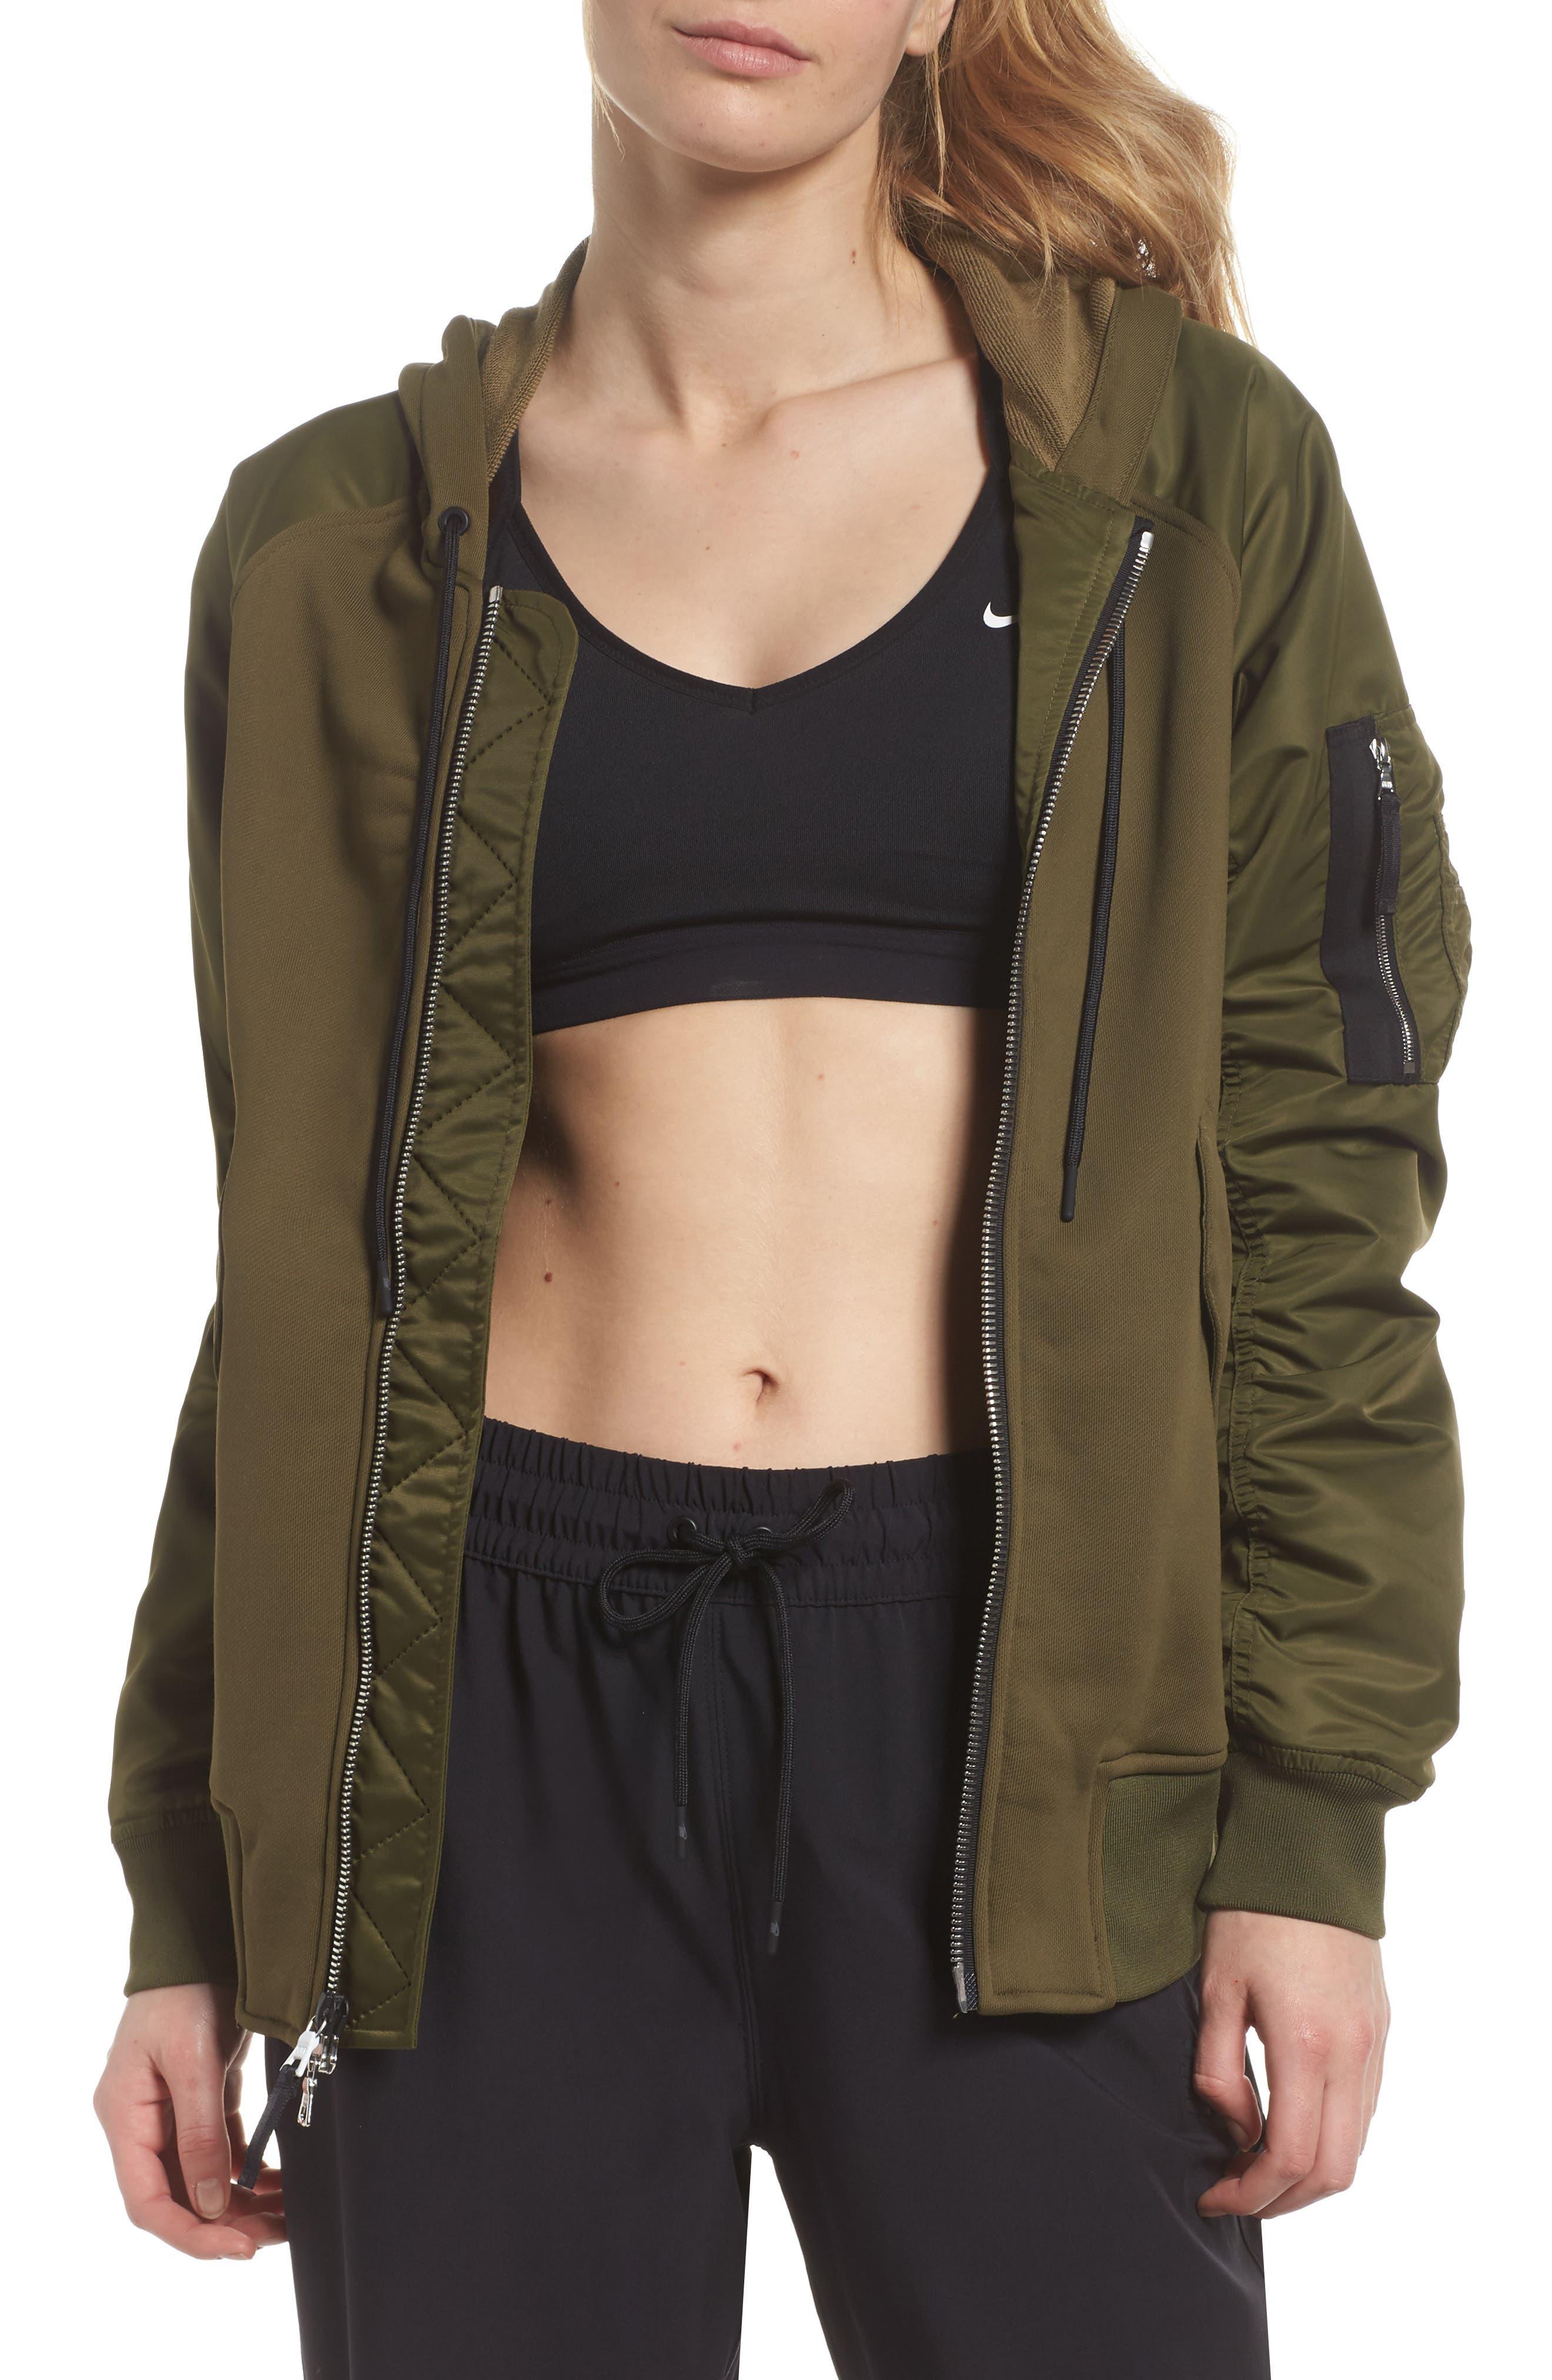 NikeLab Women's Mixed Media Bomber Jacket,                             Main thumbnail 1, color,